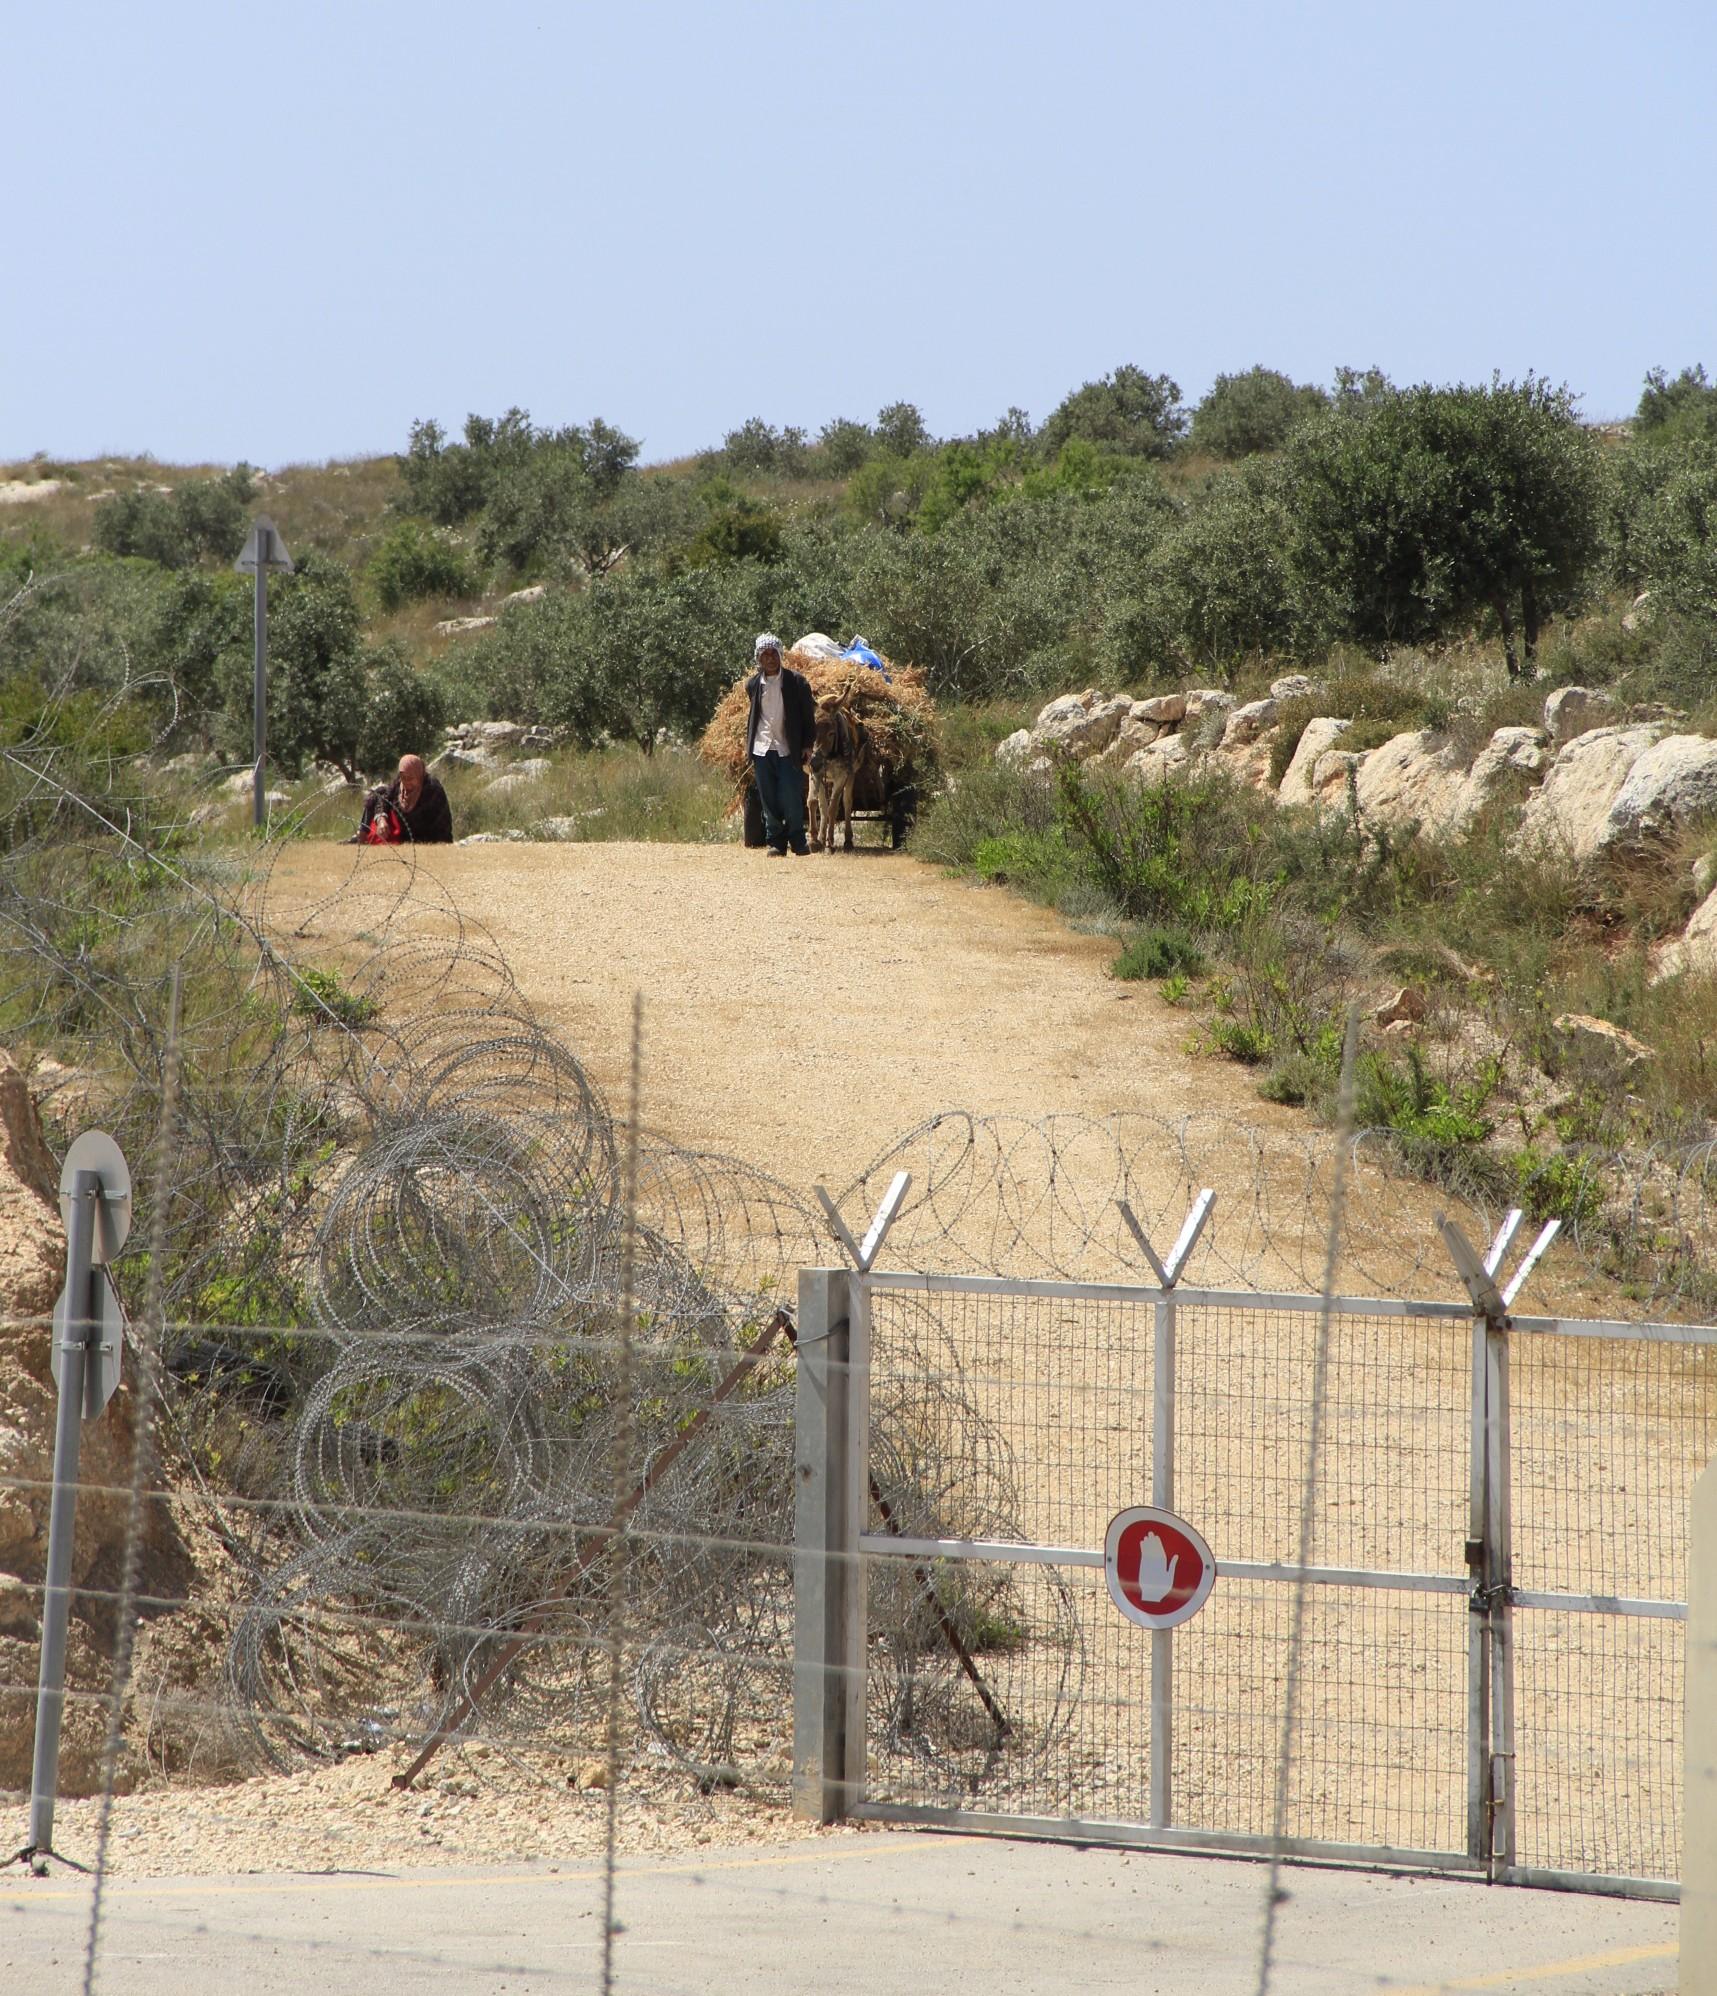 Portes agricoles : Israël resserre l'étau